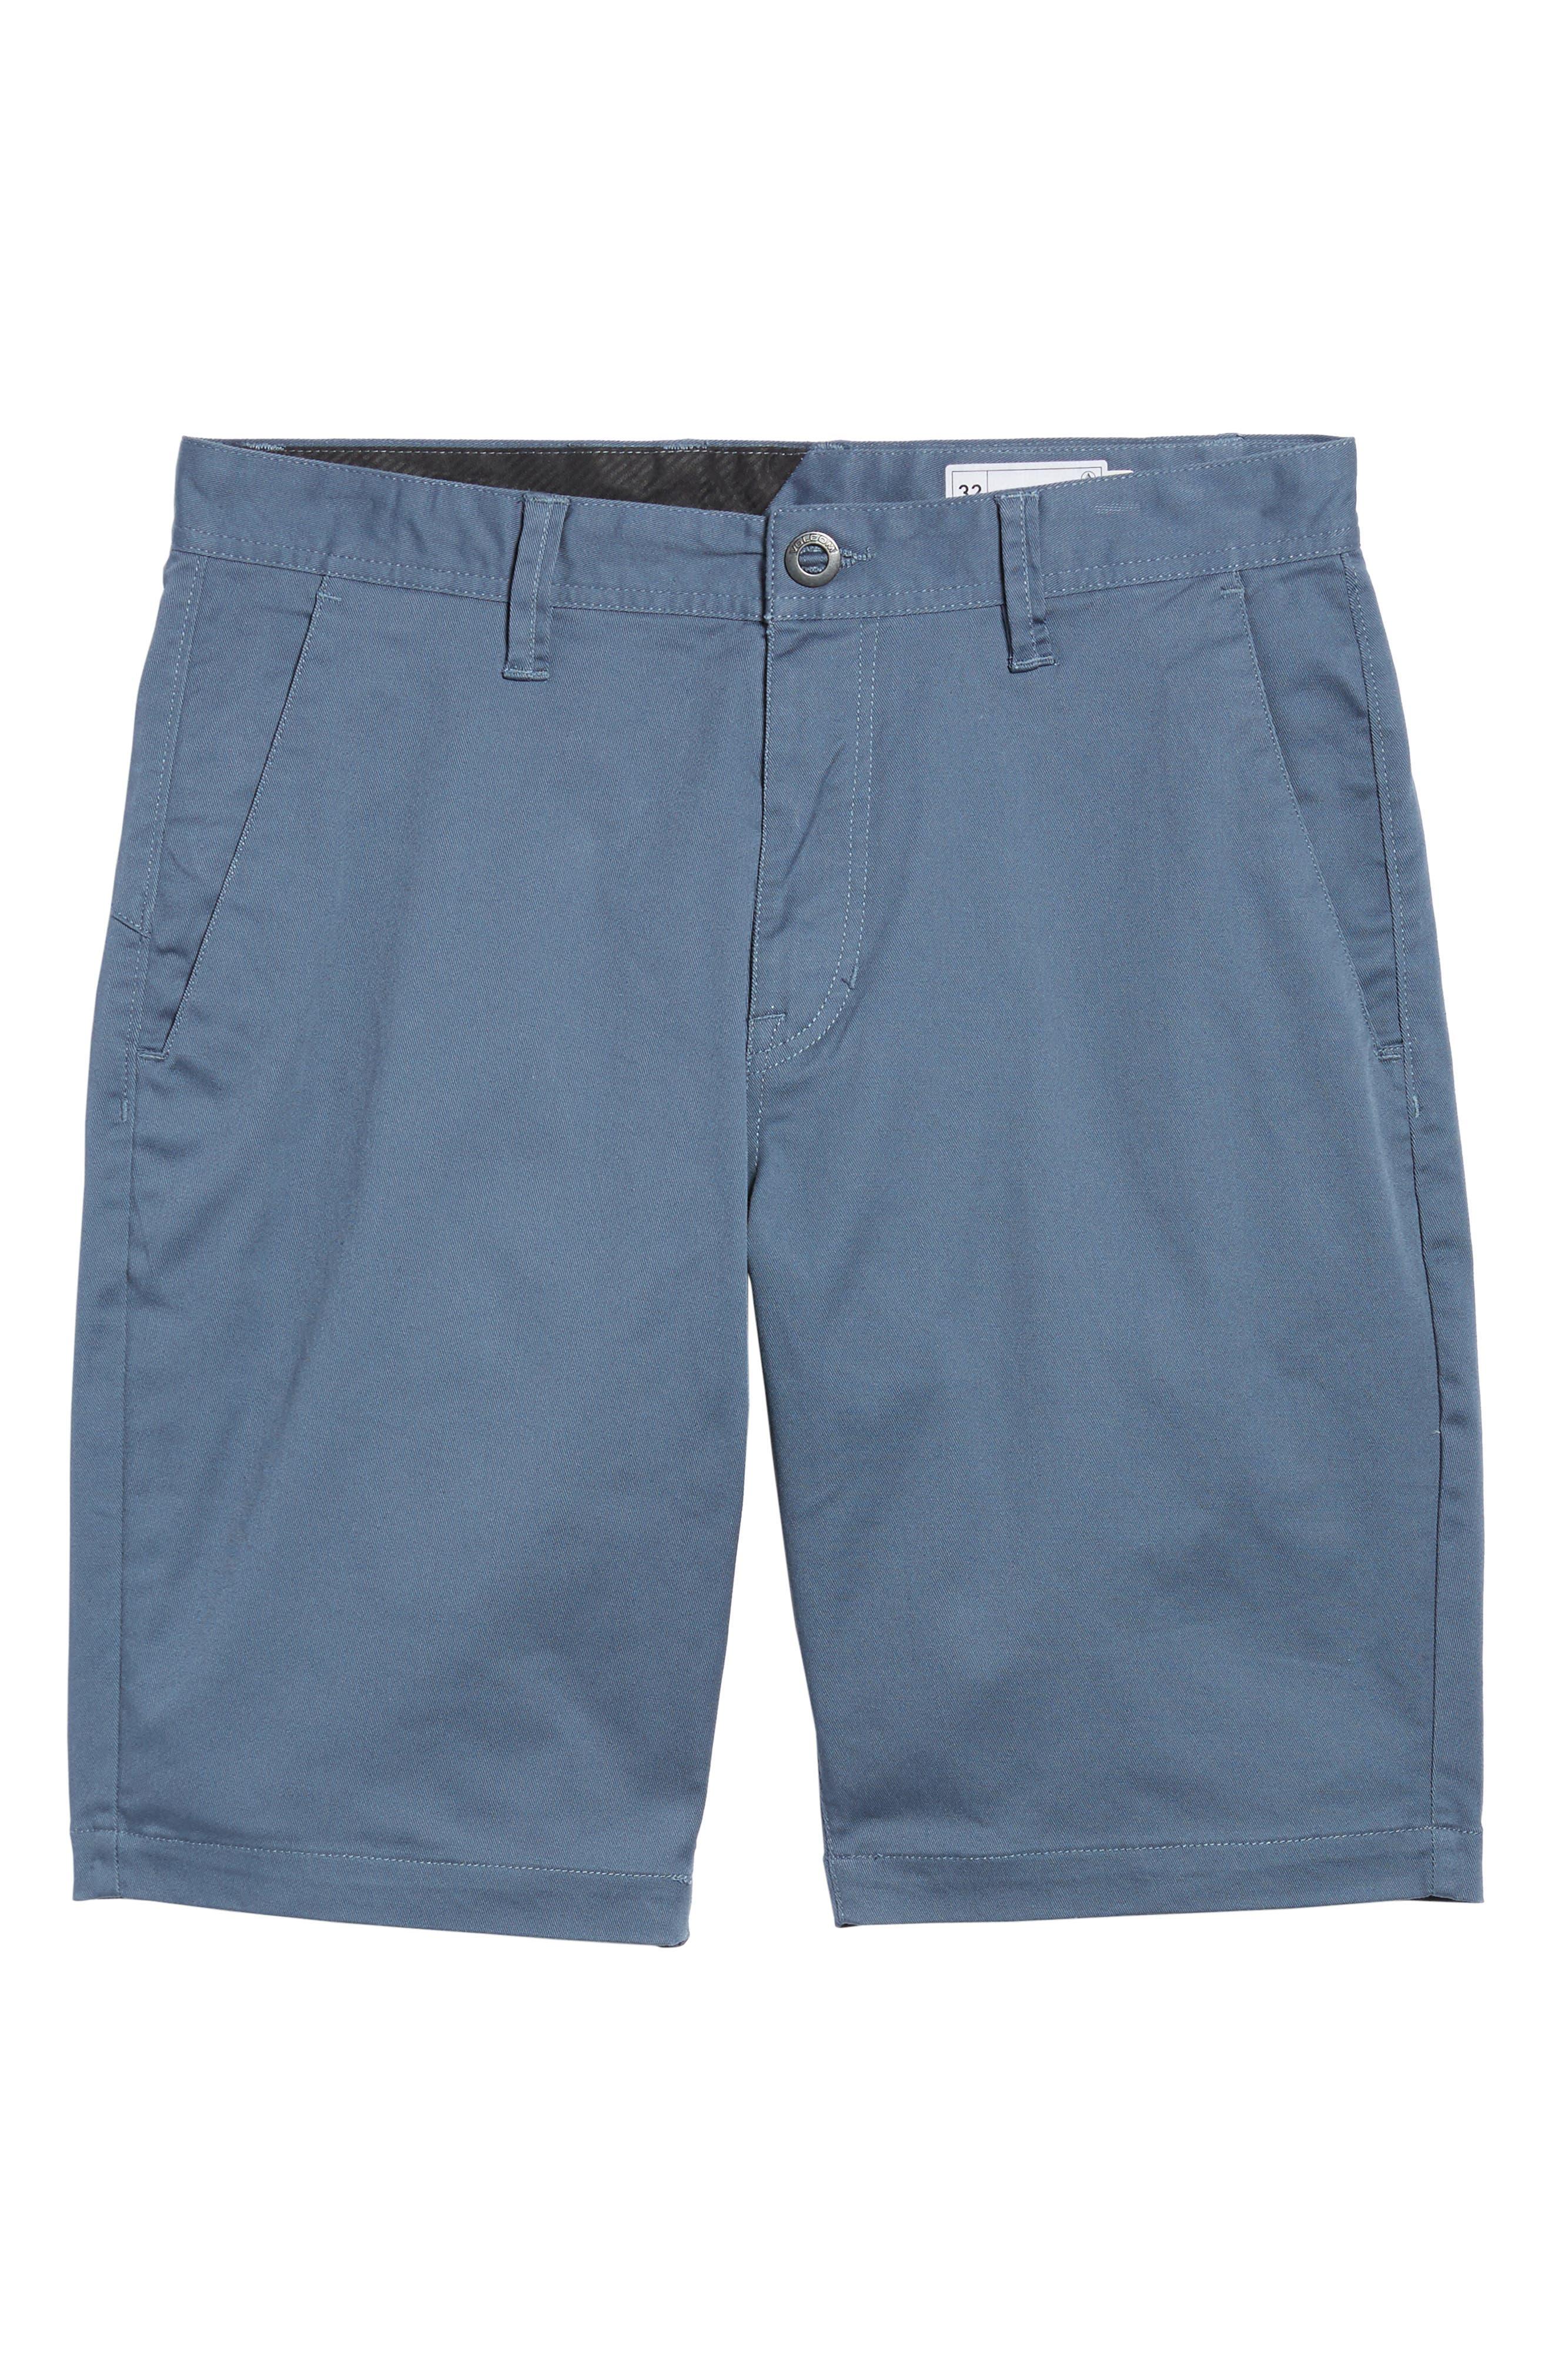 'Modern' Stretch Chino Shorts,                             Alternate thumbnail 54, color,